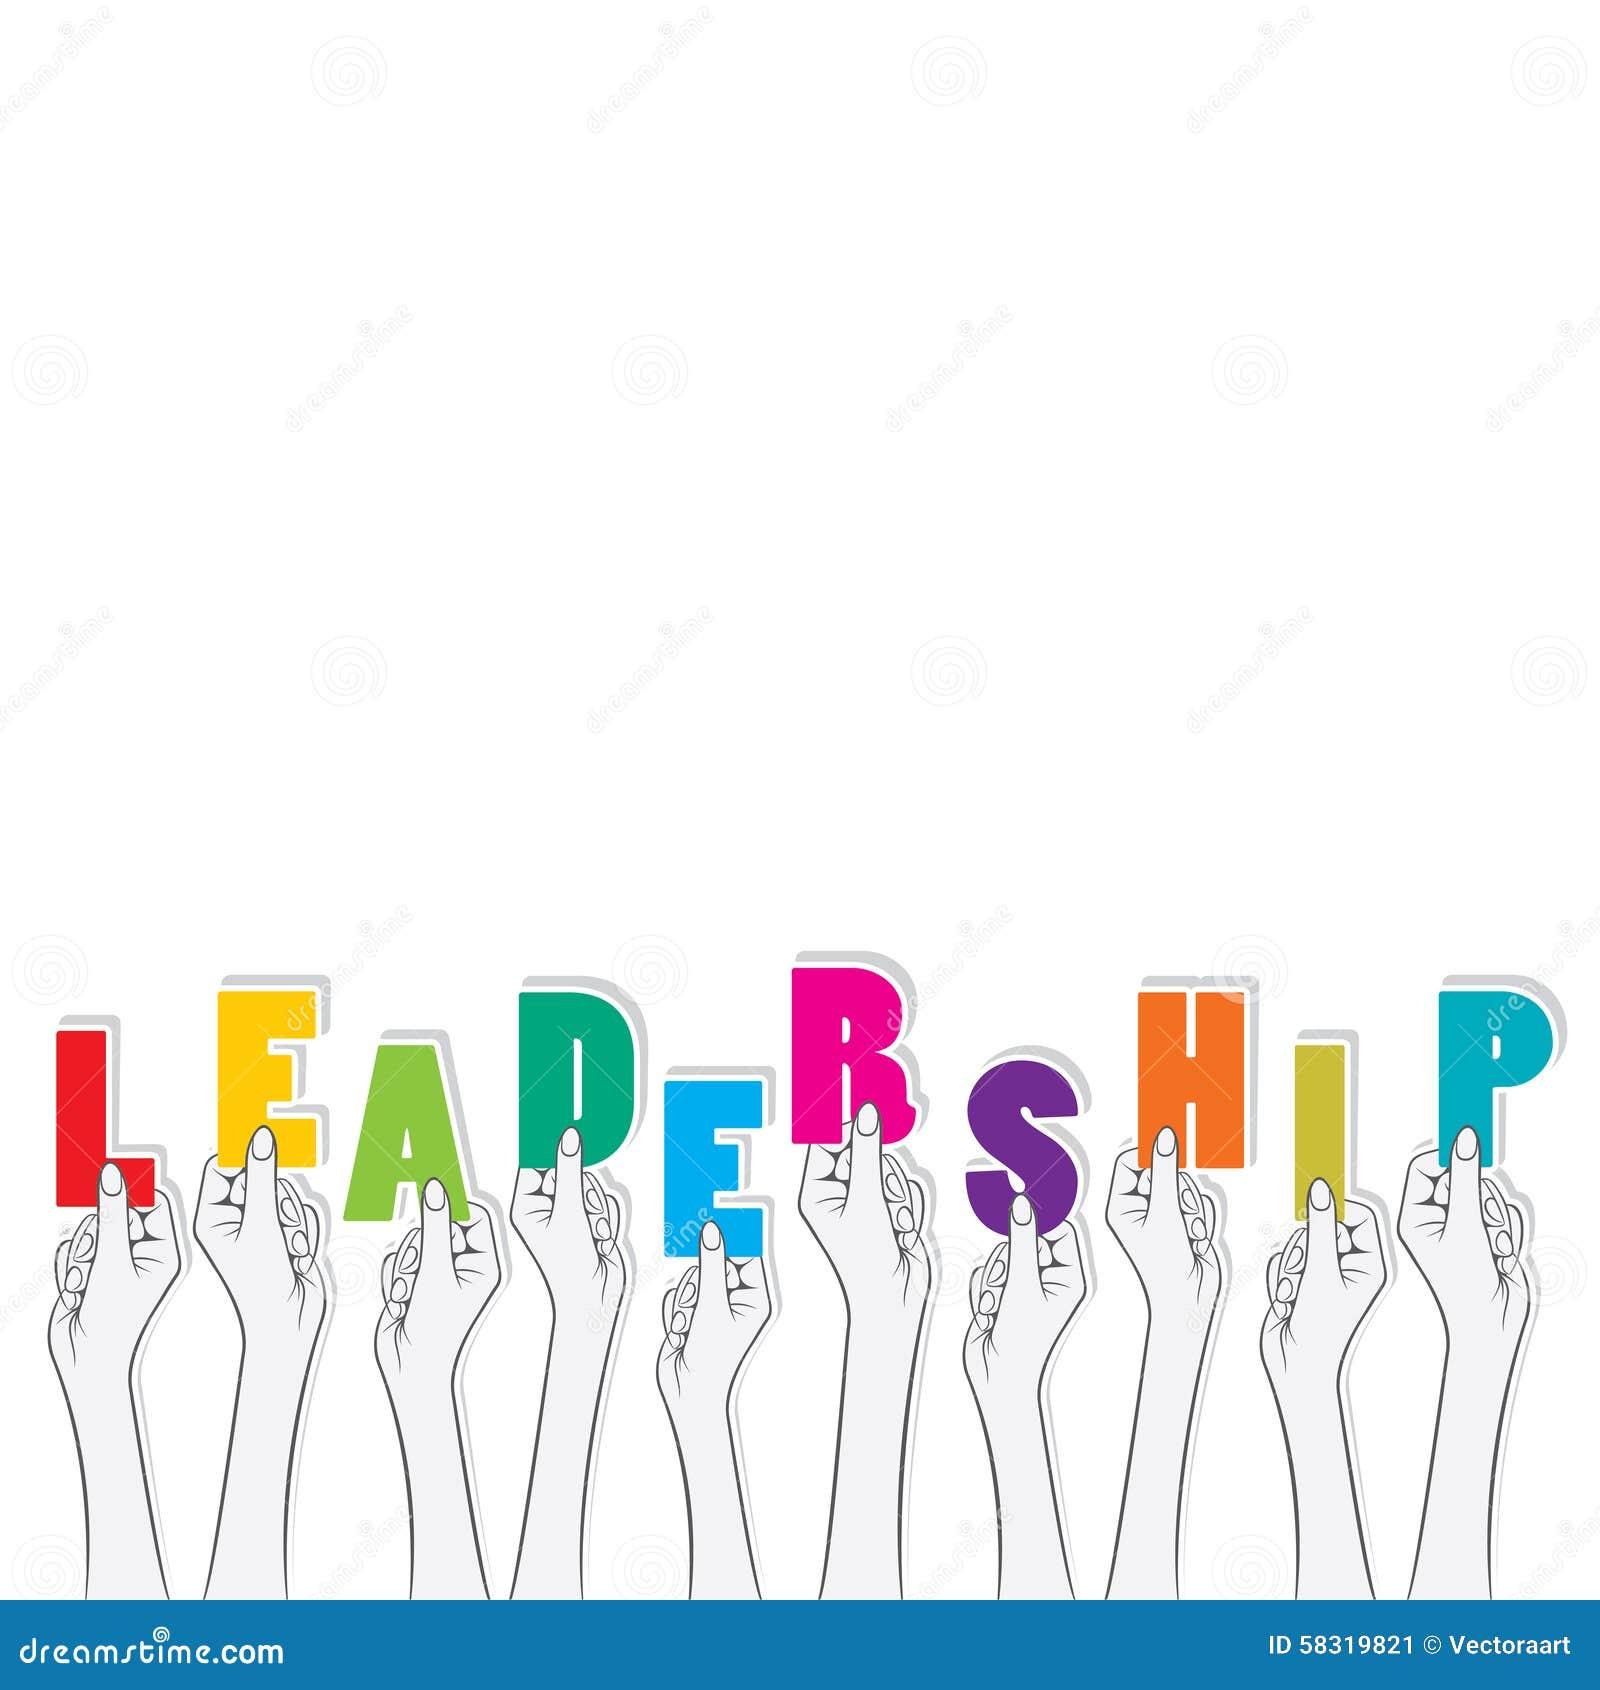 Leadership Banner Concept Design Stock Vector Illustration Of Concept Letter 58319821